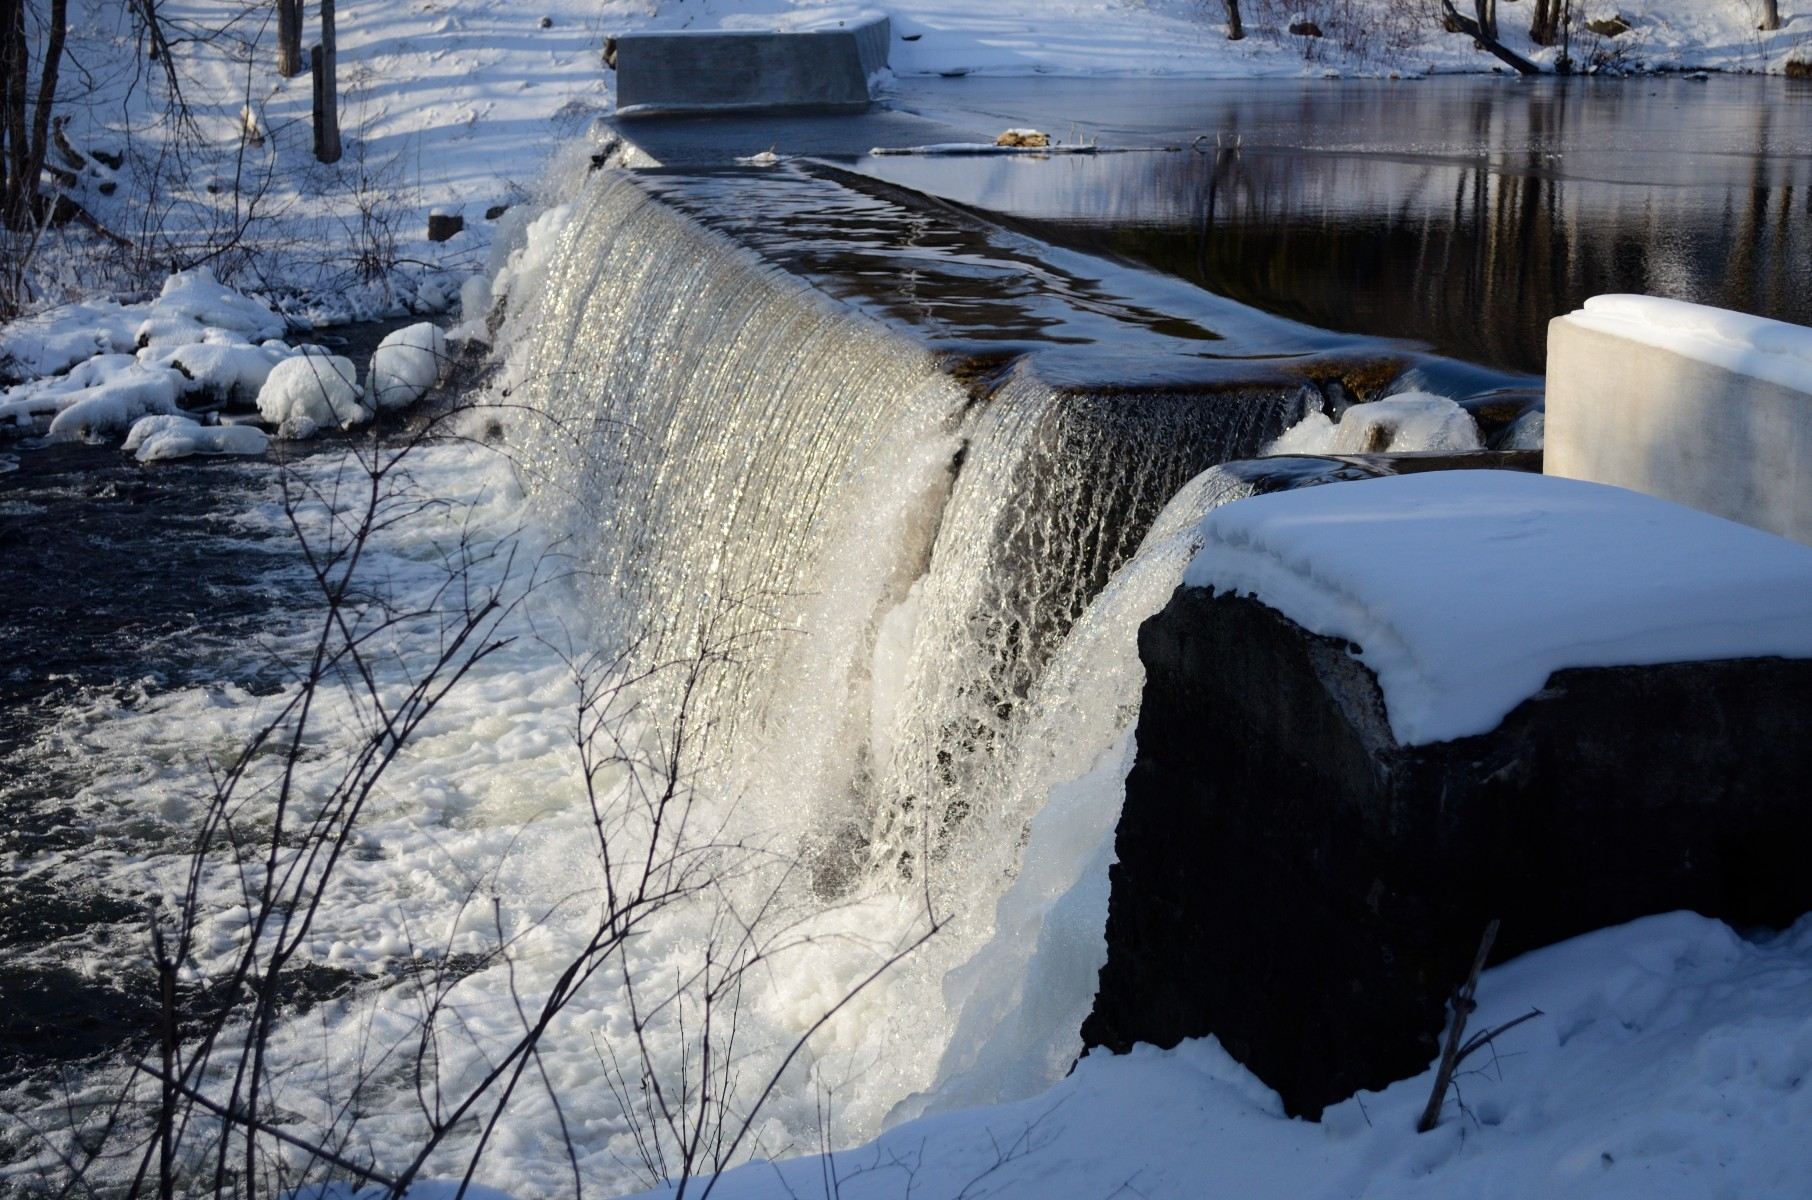 maine dam in winter by ryan fish